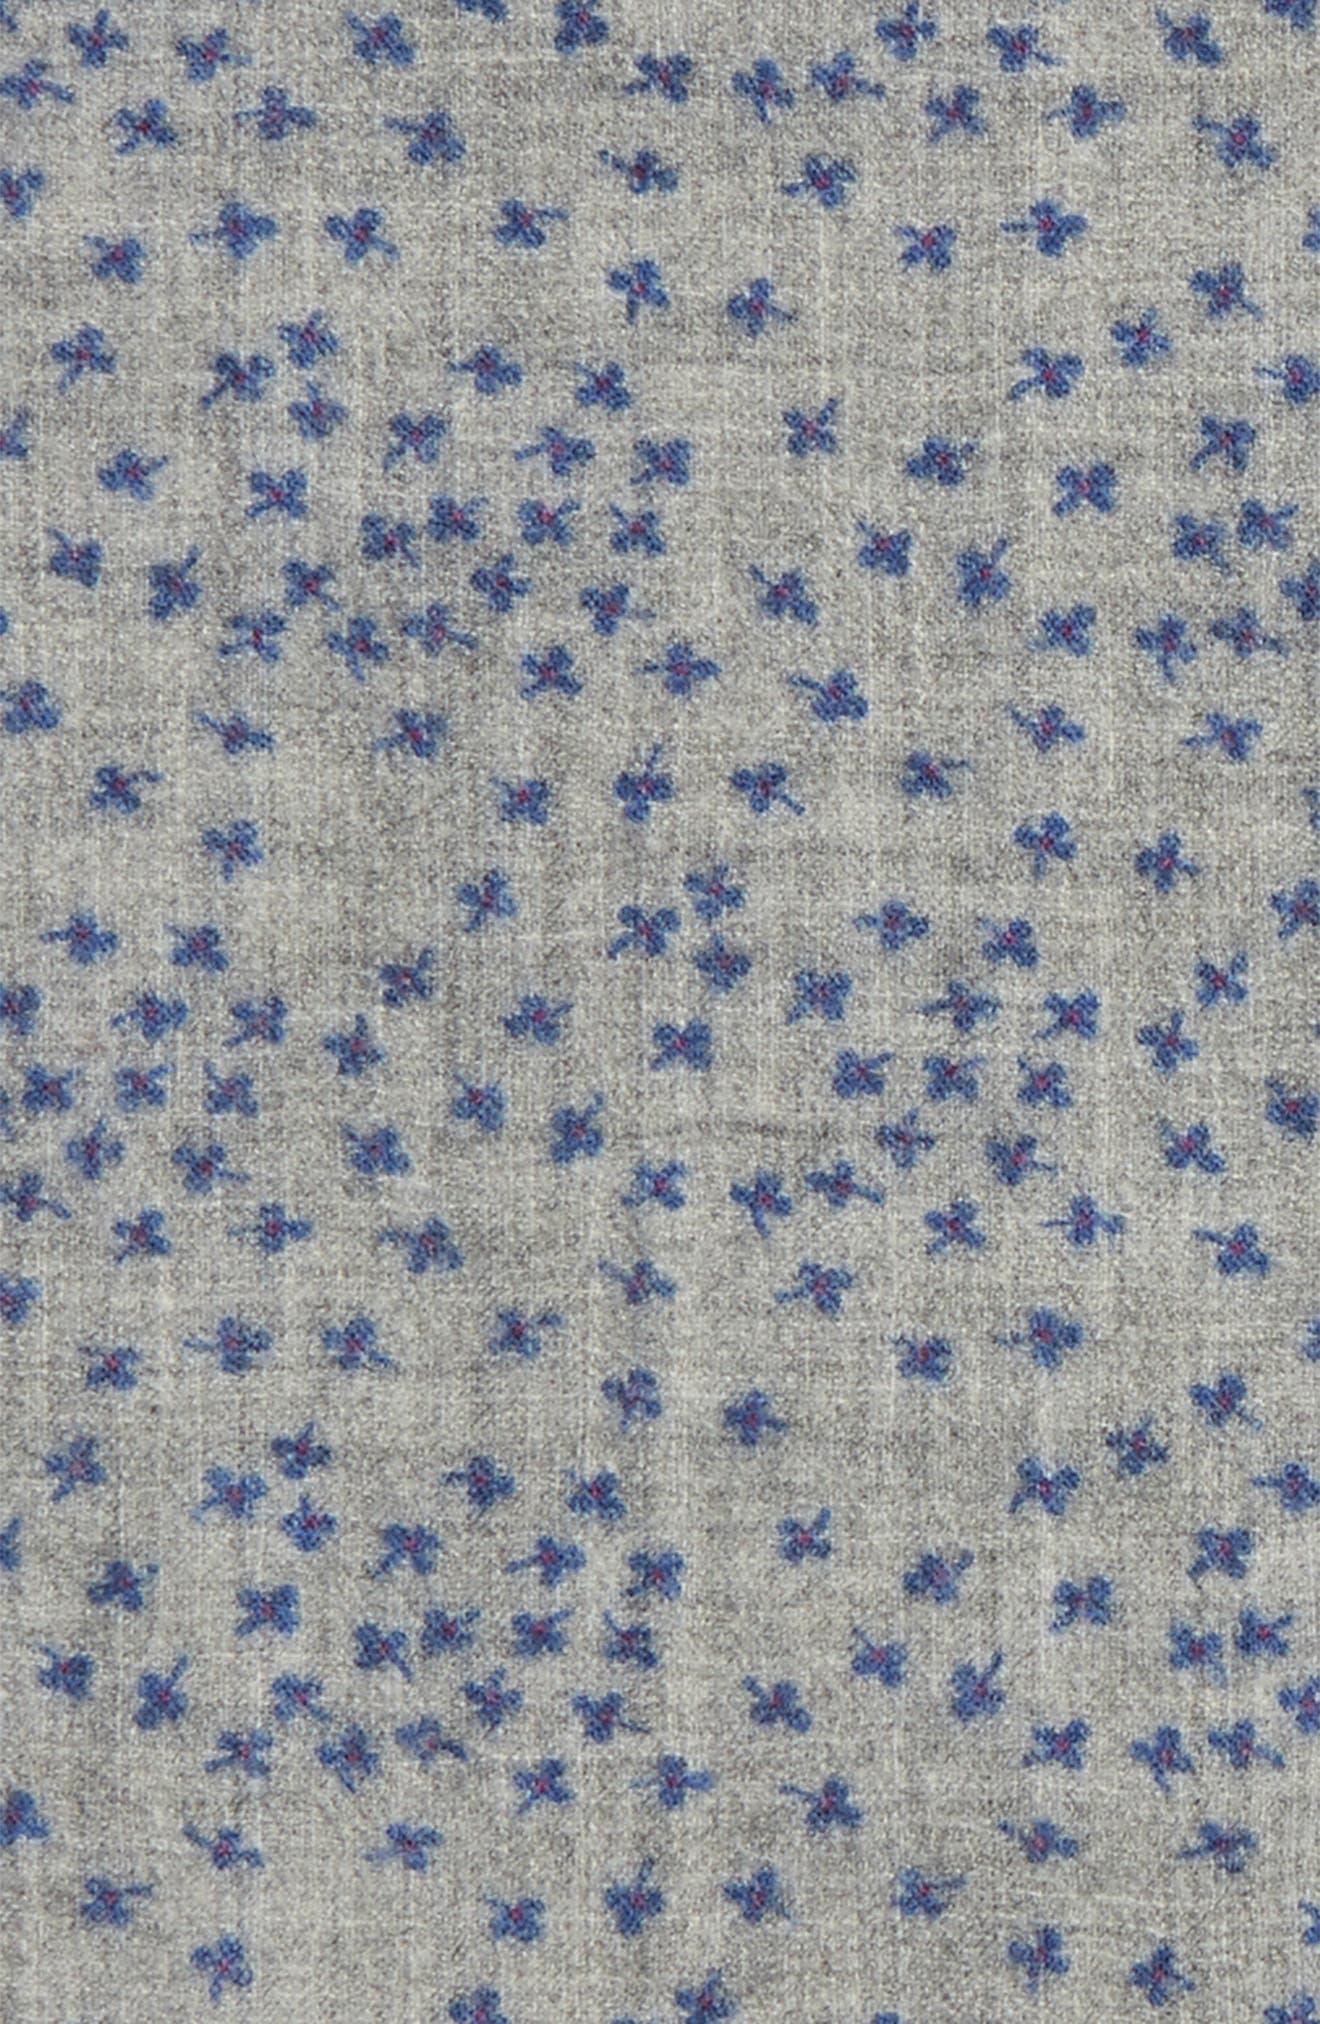 Patterned Wool Pocket Square,                             Alternate thumbnail 3, color,                             Floral Grey